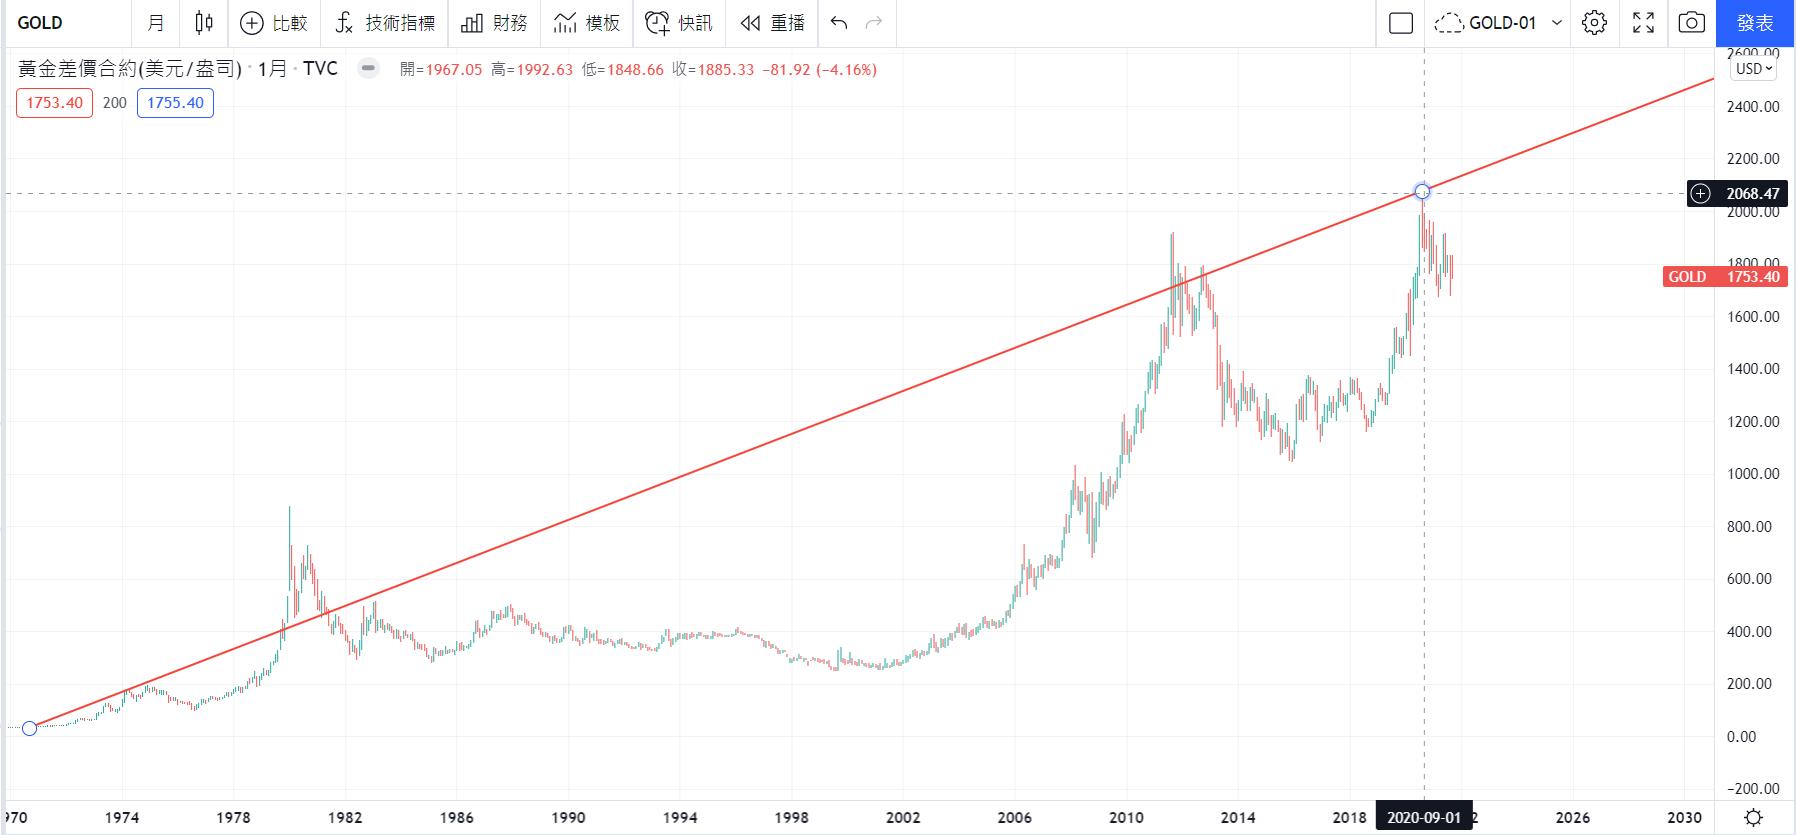 Tradingview圖表黃金價格走勢 2021年9月